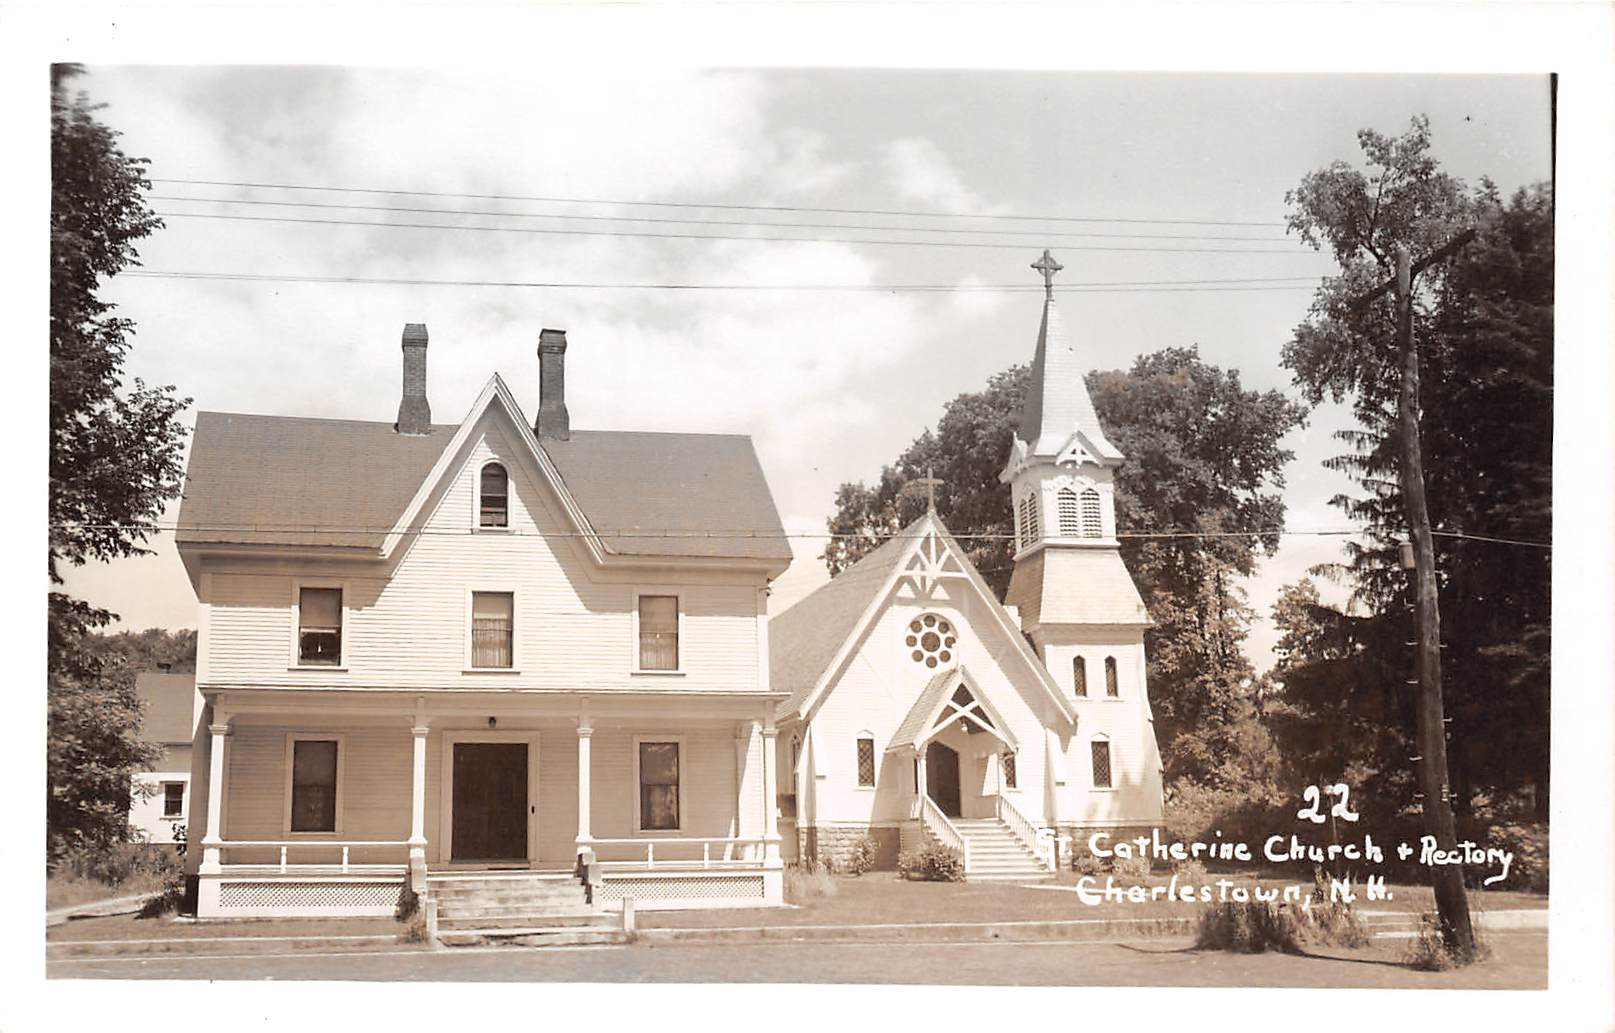 St Catherine Church & Rectory - Charlestown, New Hampshire NH Postcard